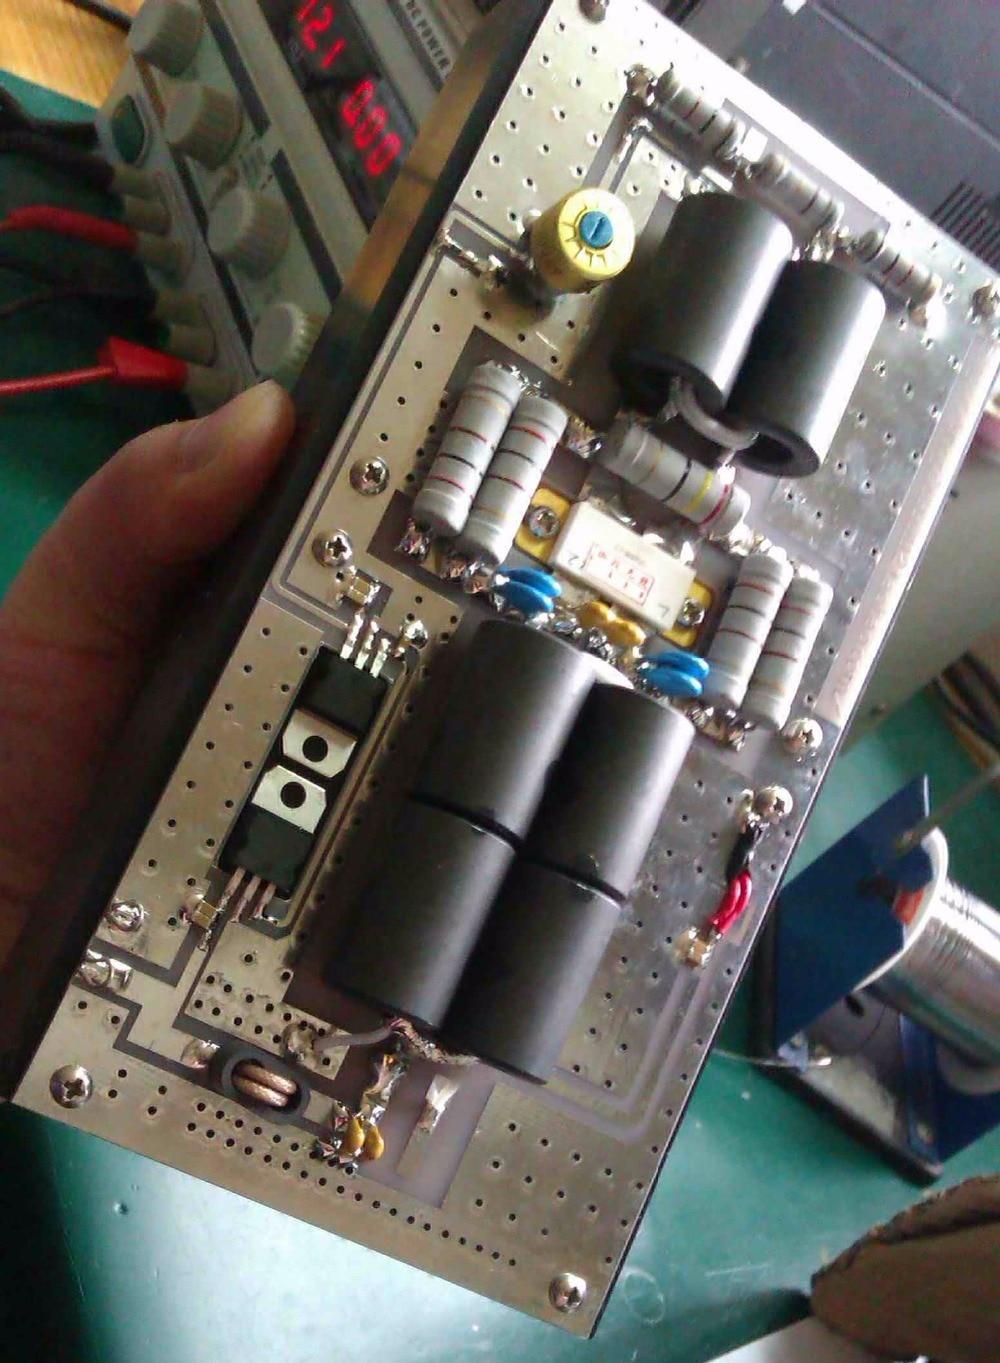 2MHz-40MHz 50w 12-15V HF power amplifier Shortwave Power Amplifier Broadband RF Amplifier 2mhz 40mhz 50w 12 15v hf power amplifier shortwave power amplifier broadband rf amplifier